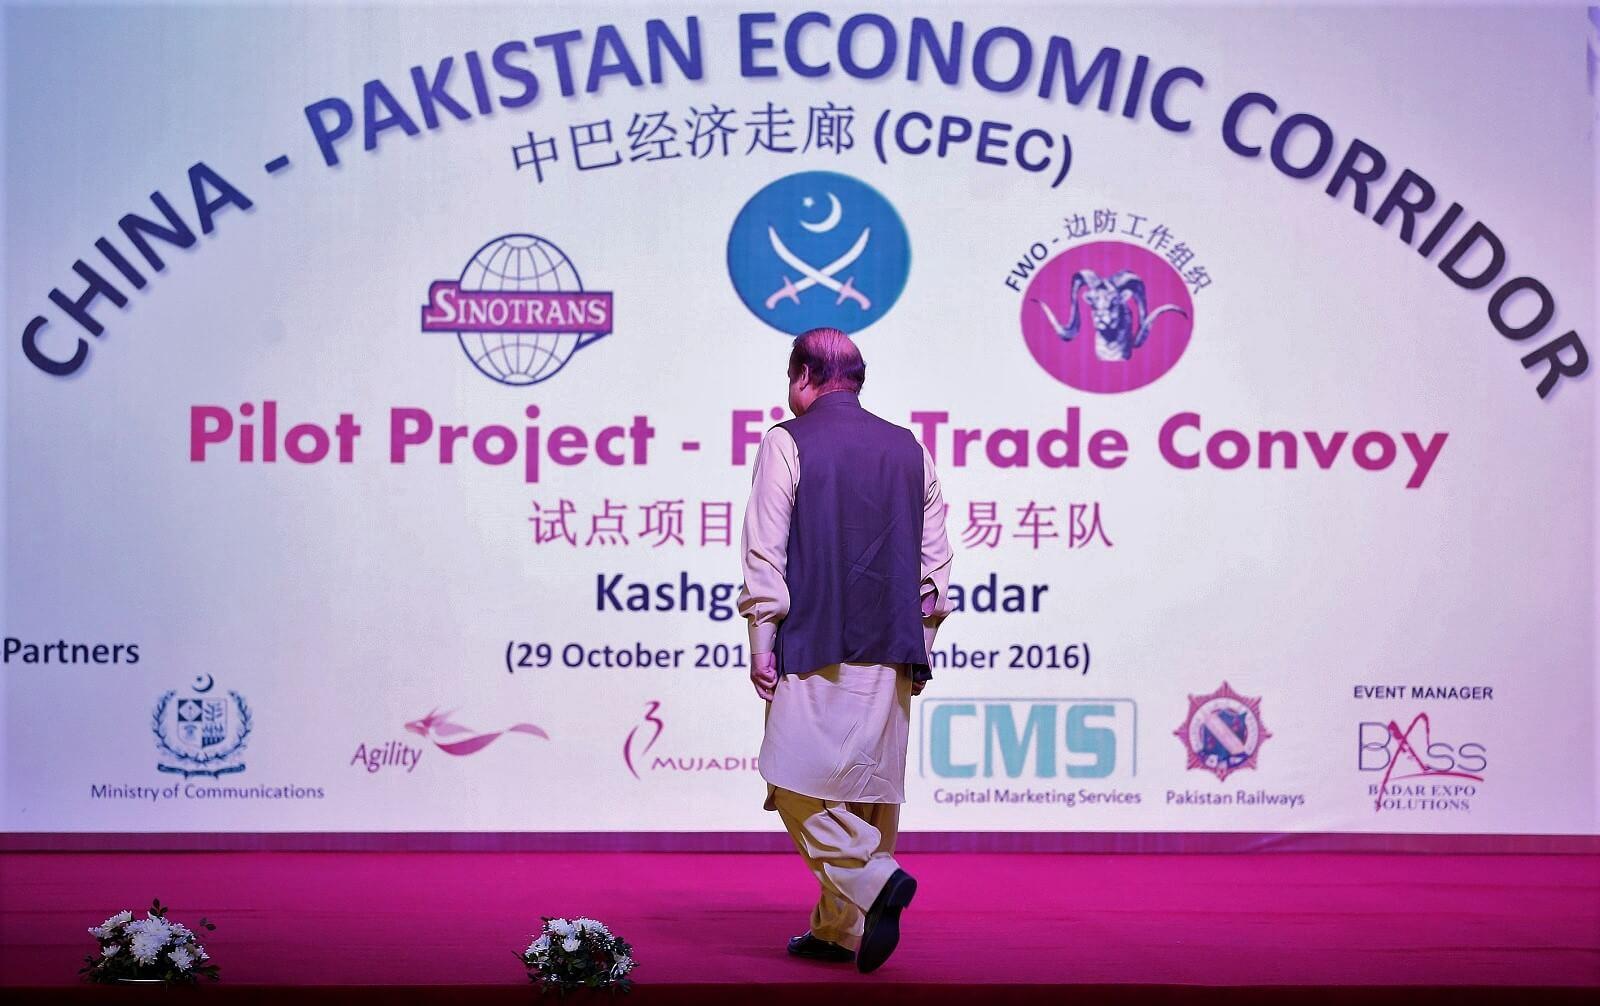 Prime Minister of Pakistan Nawaz Sharif at a ceremony in Gwadar port, 2016 (Photo: Metin Aktas via Getty)